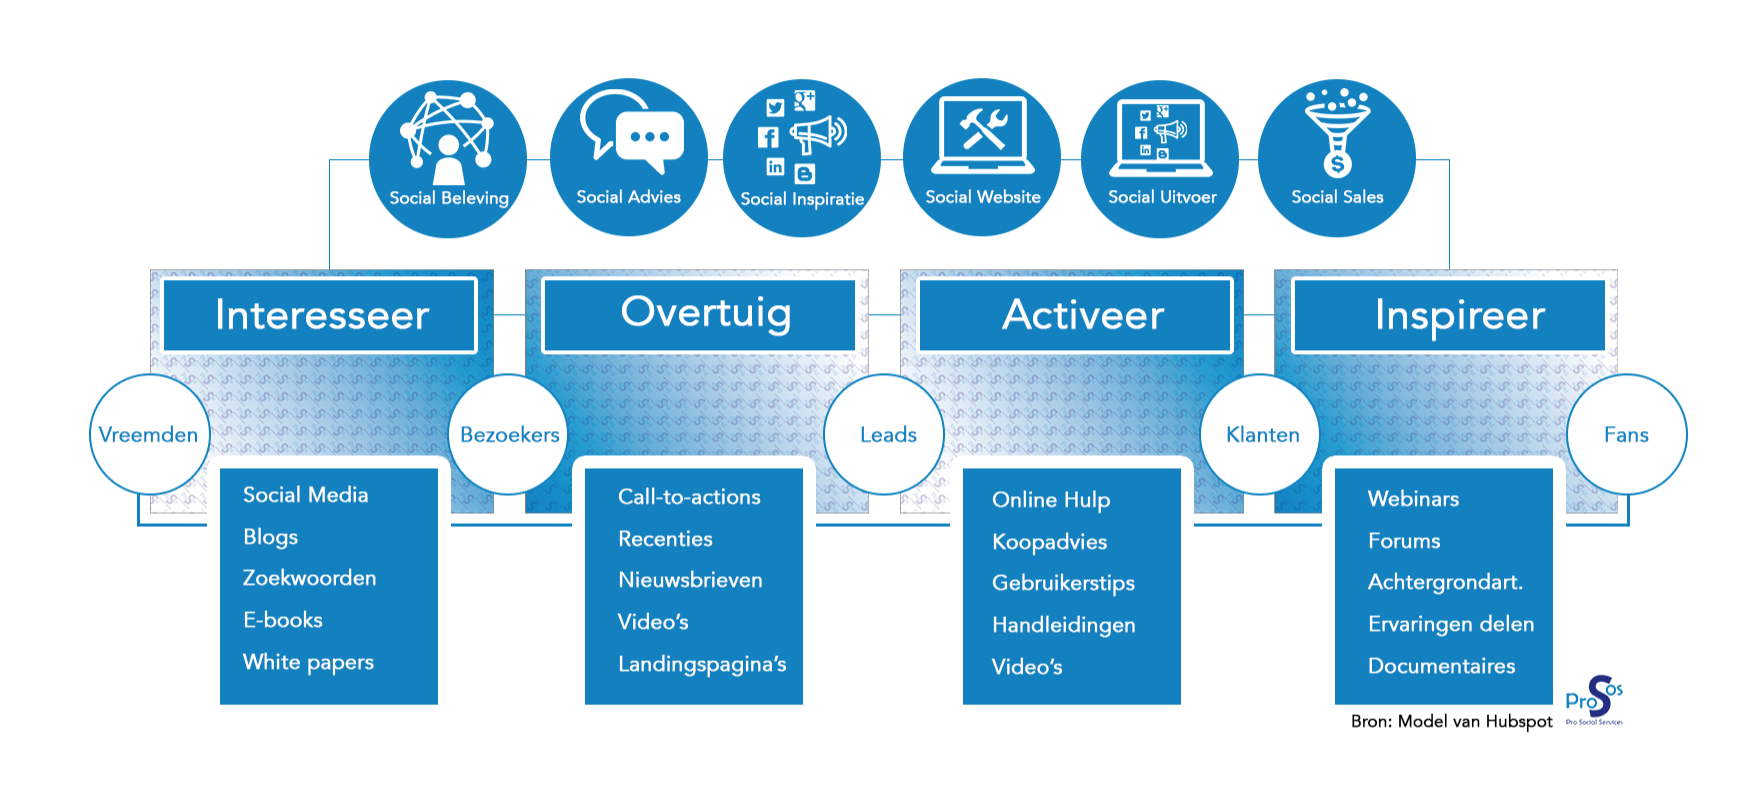 Prosos-InboundMarketing-model-2015